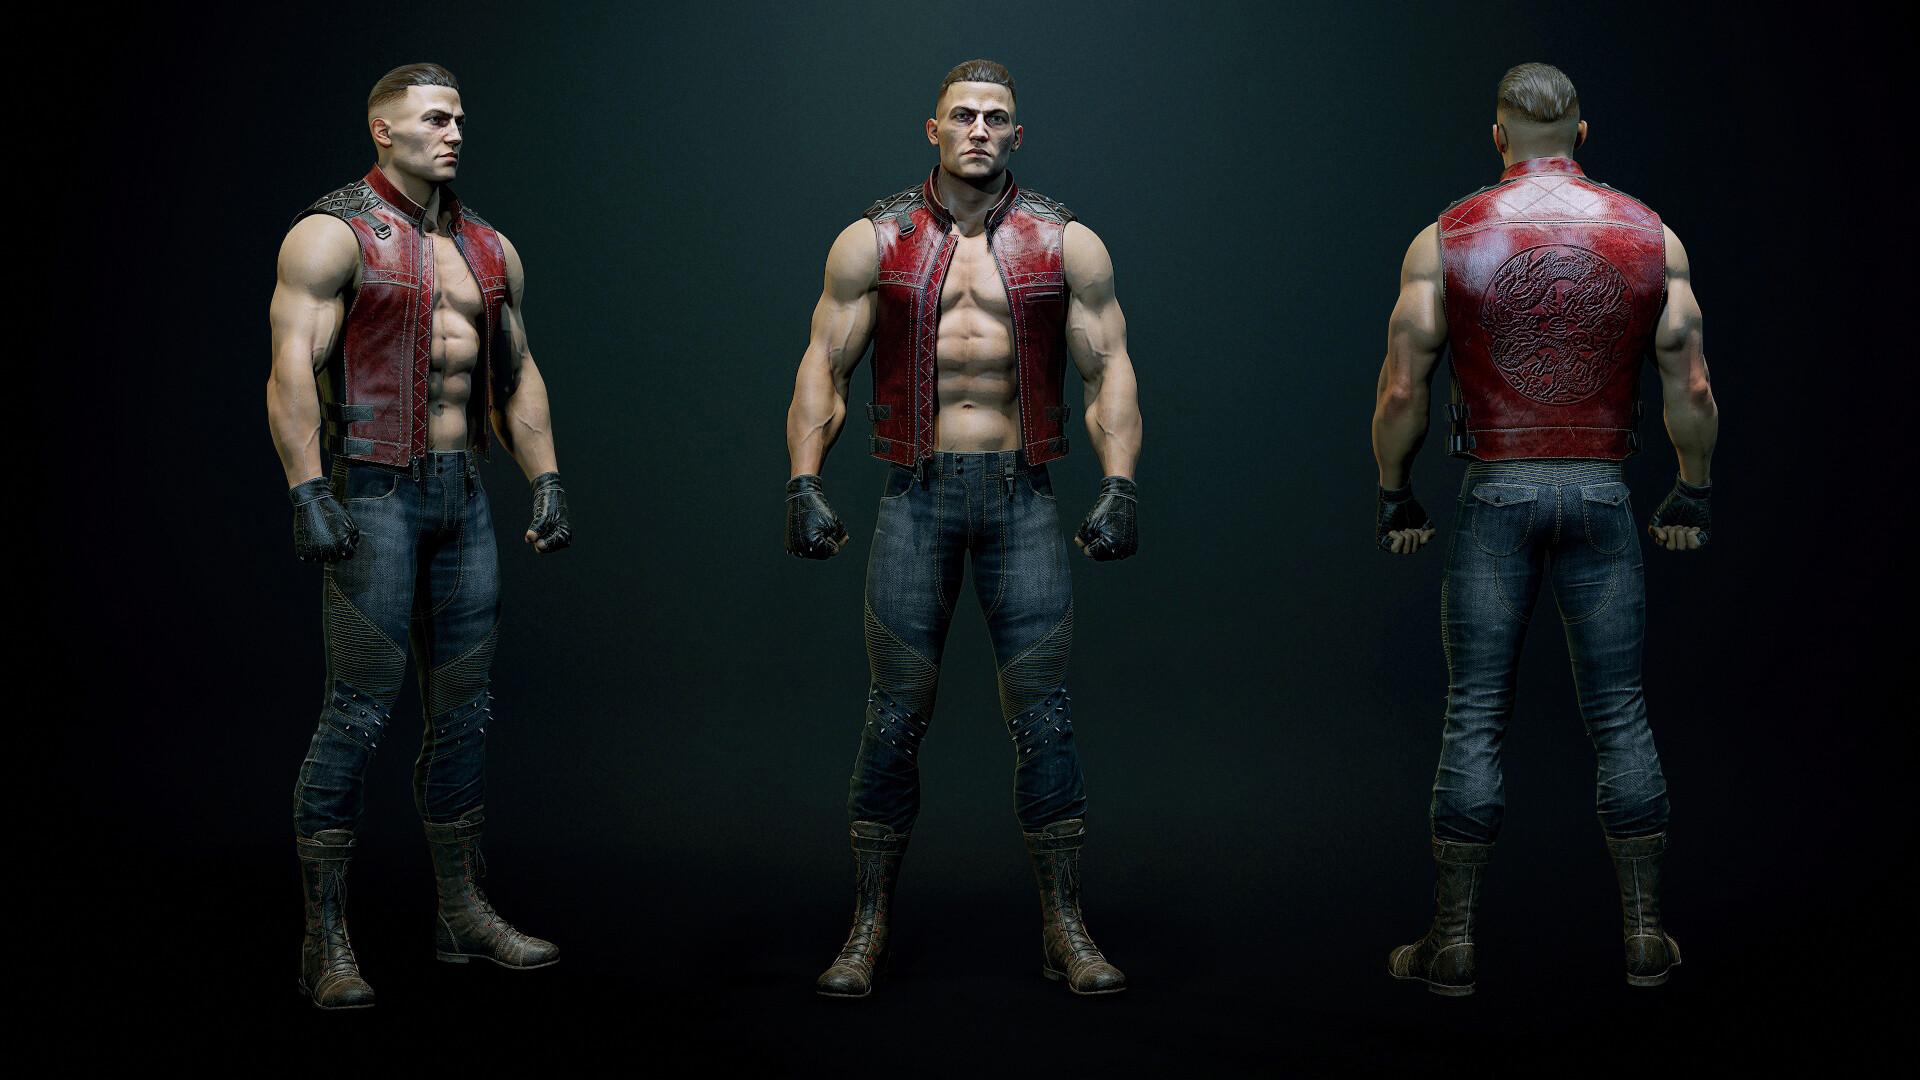 Alex Lashko 3d Art Battletoads Double Dragon